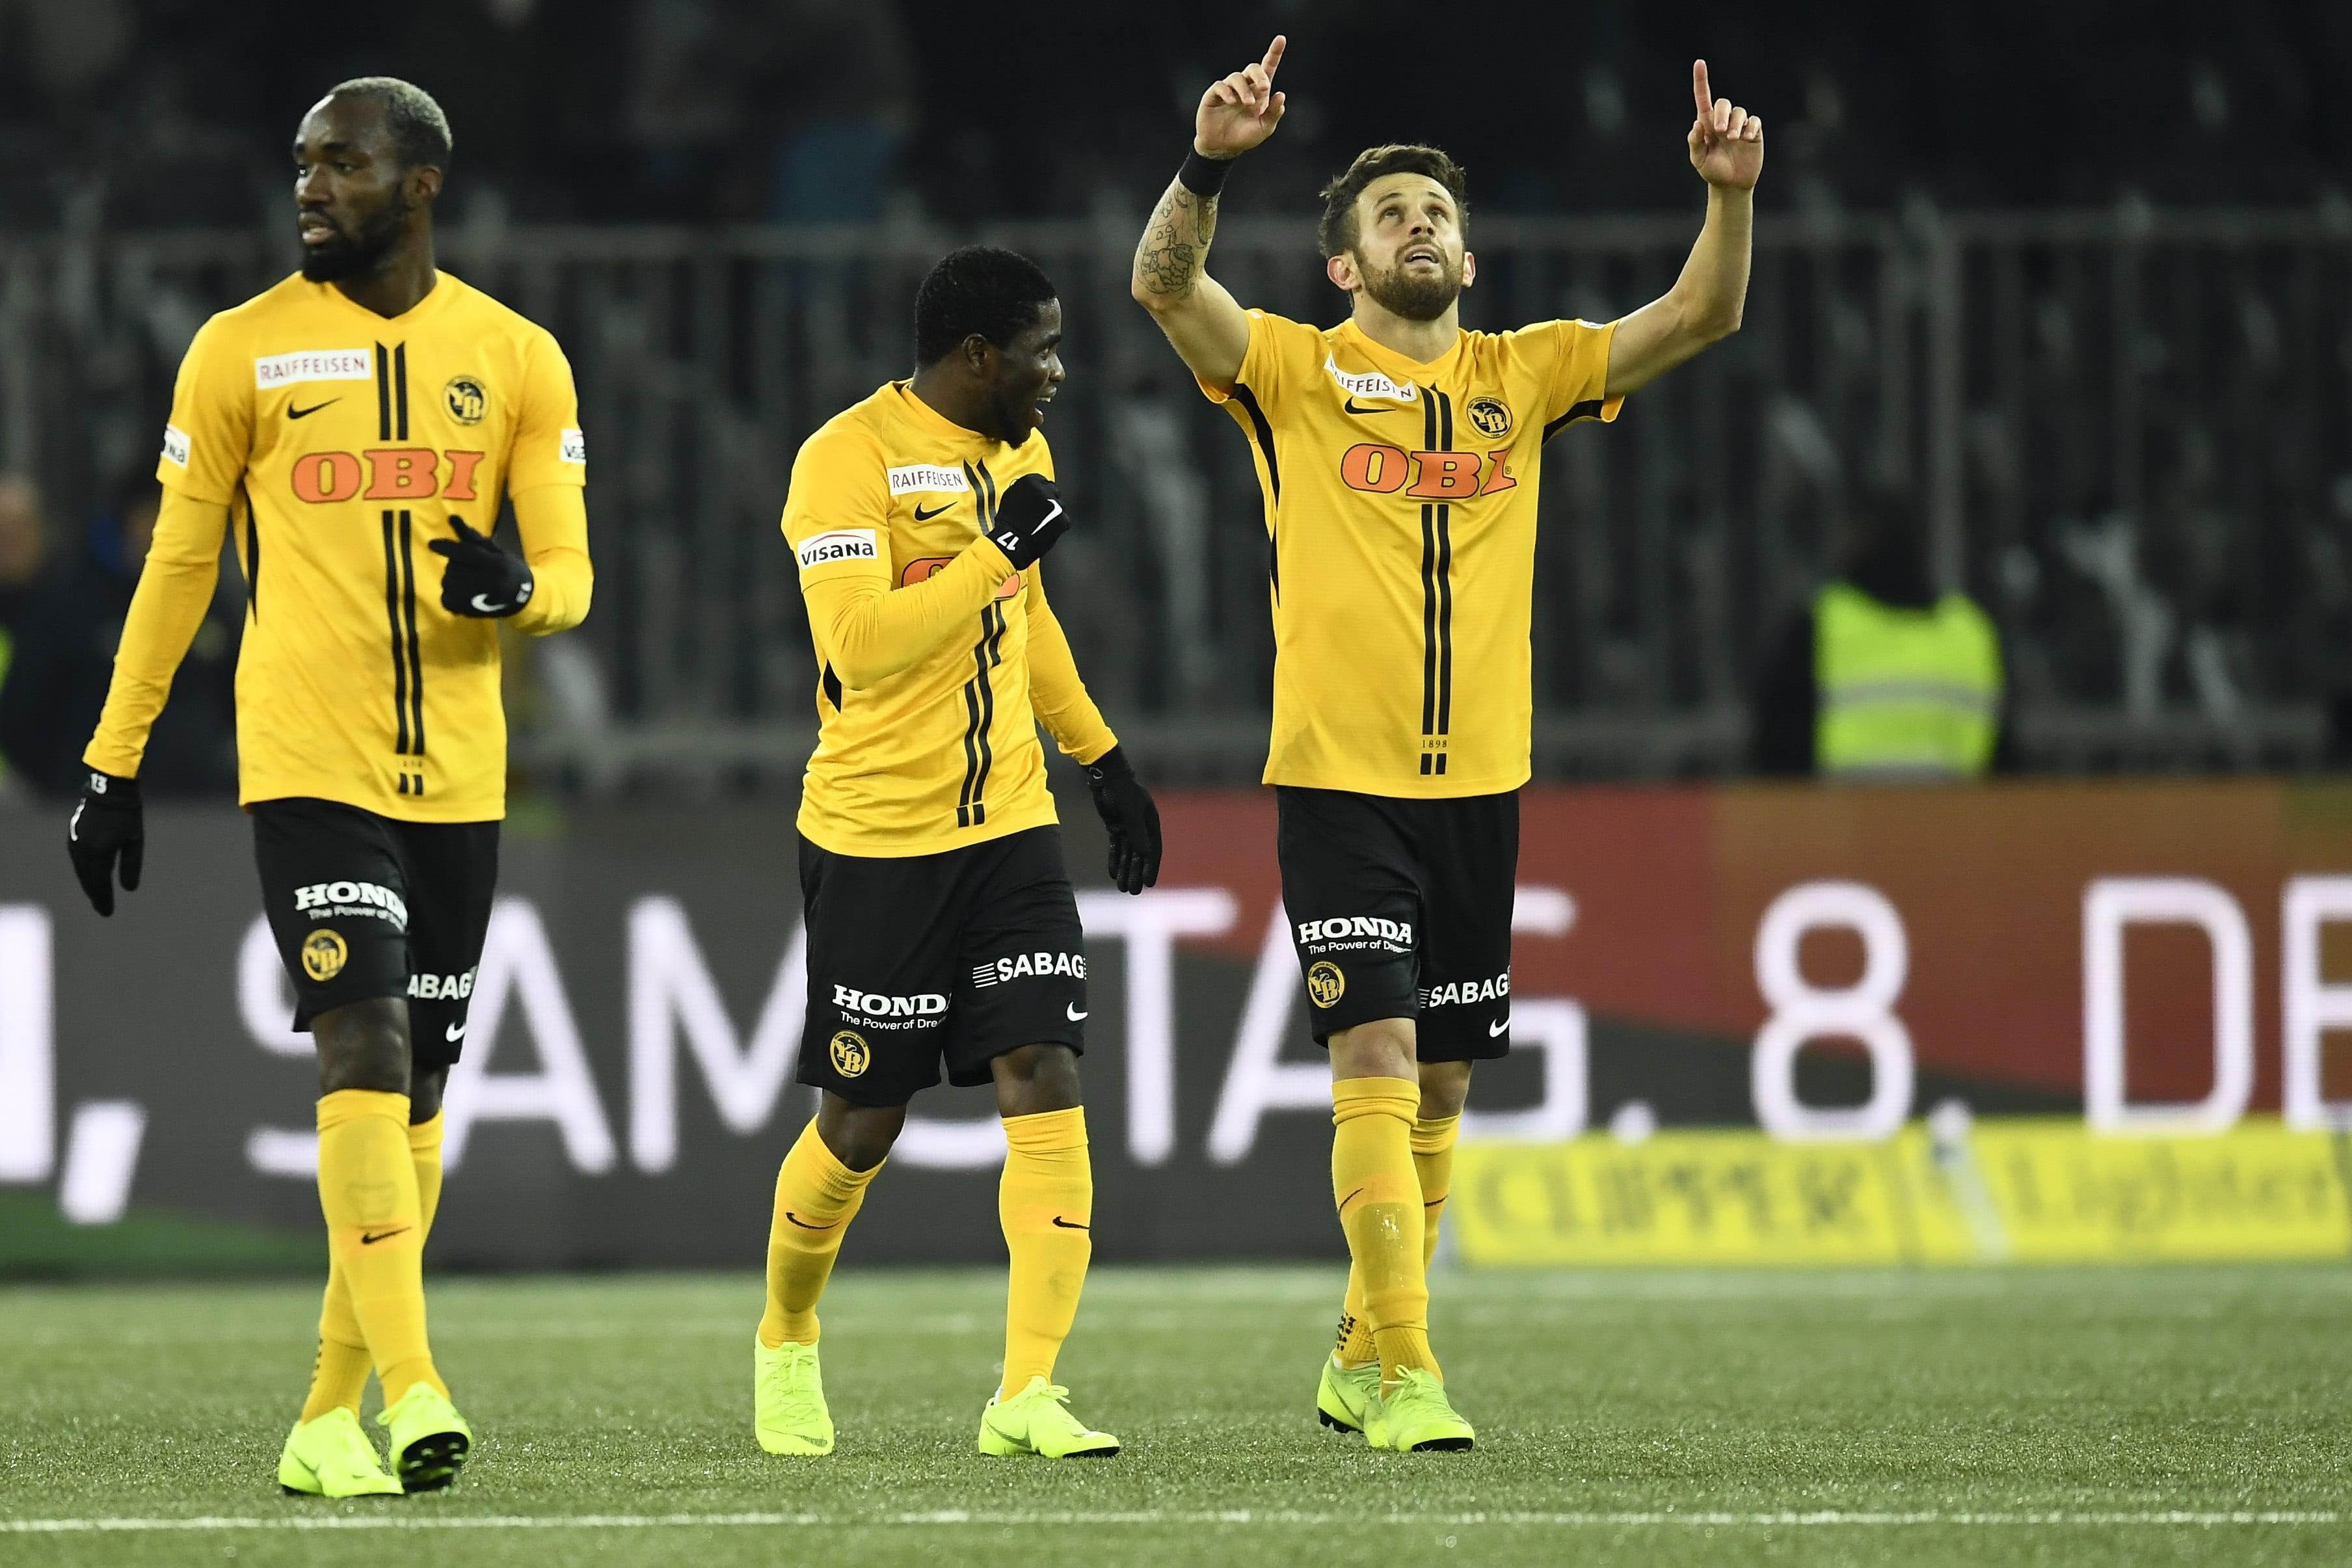 Luzern vs Young Boys Betting Predictions 4/04/2019